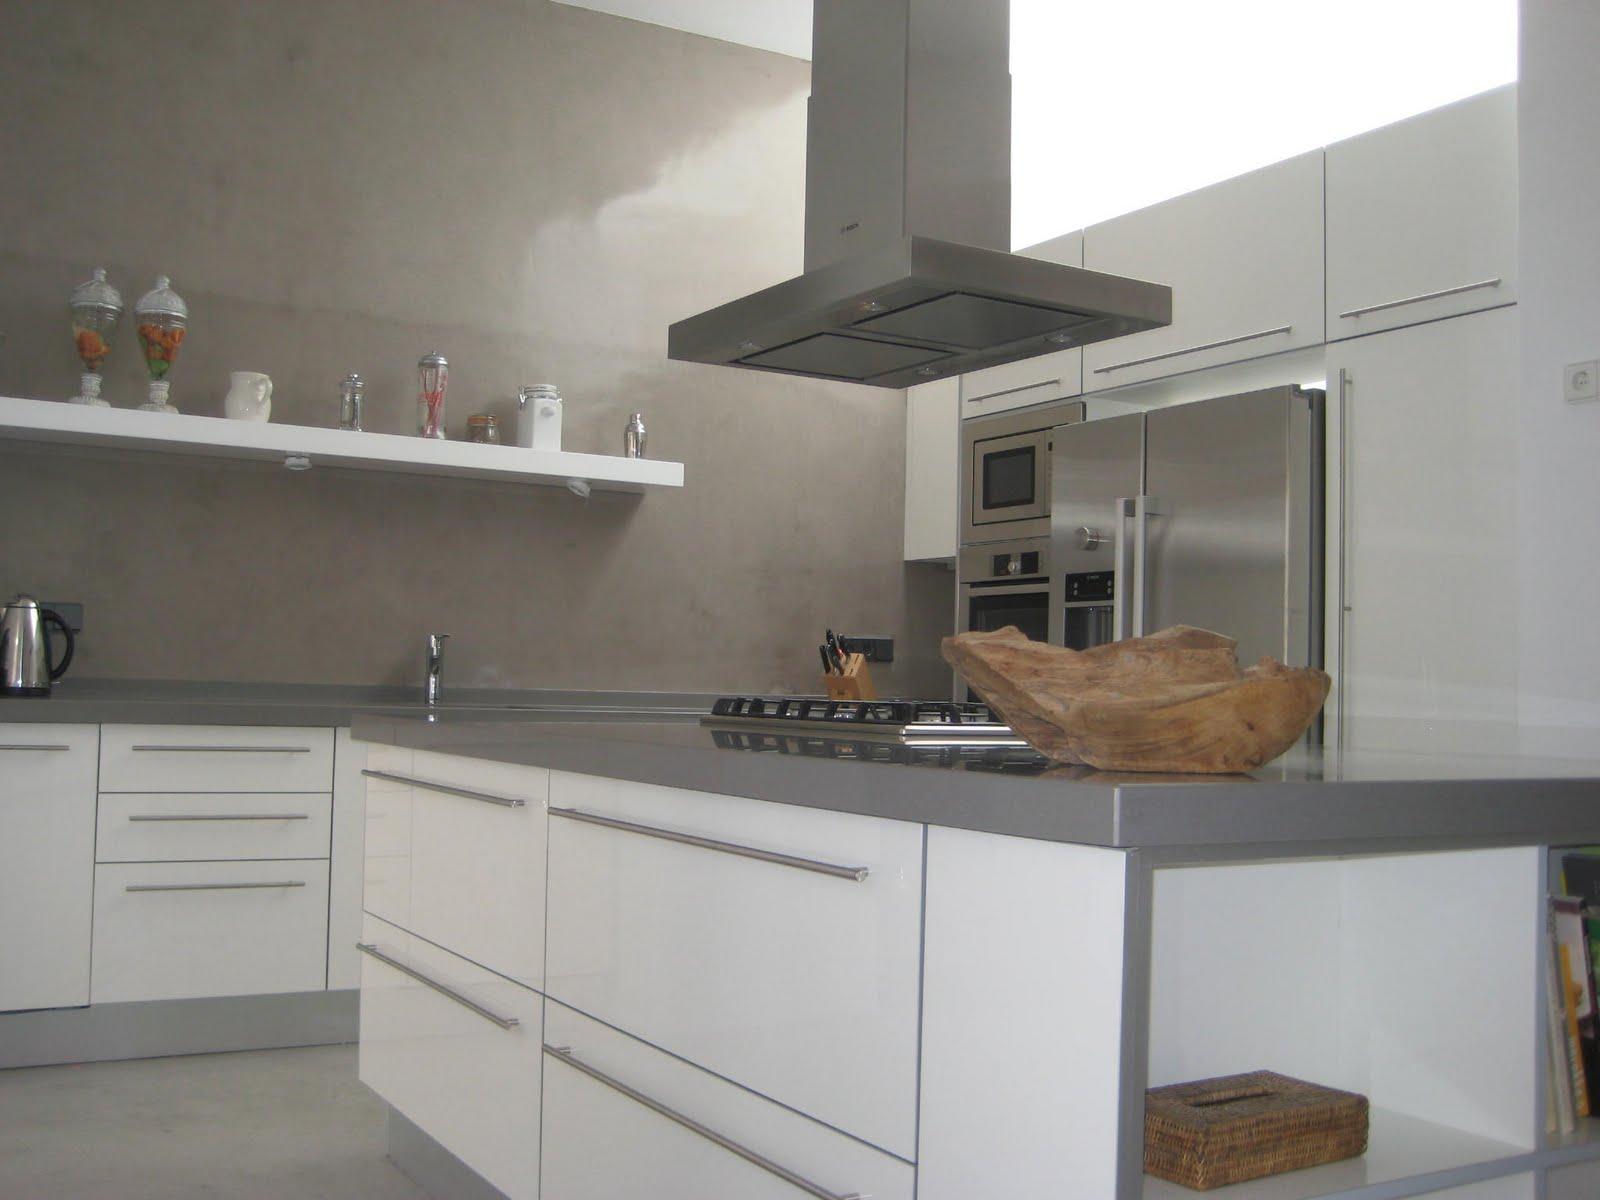 Cocinas ibiza blog de eivicuines eva palerm julio 2011 - Silestone para cocinas ...